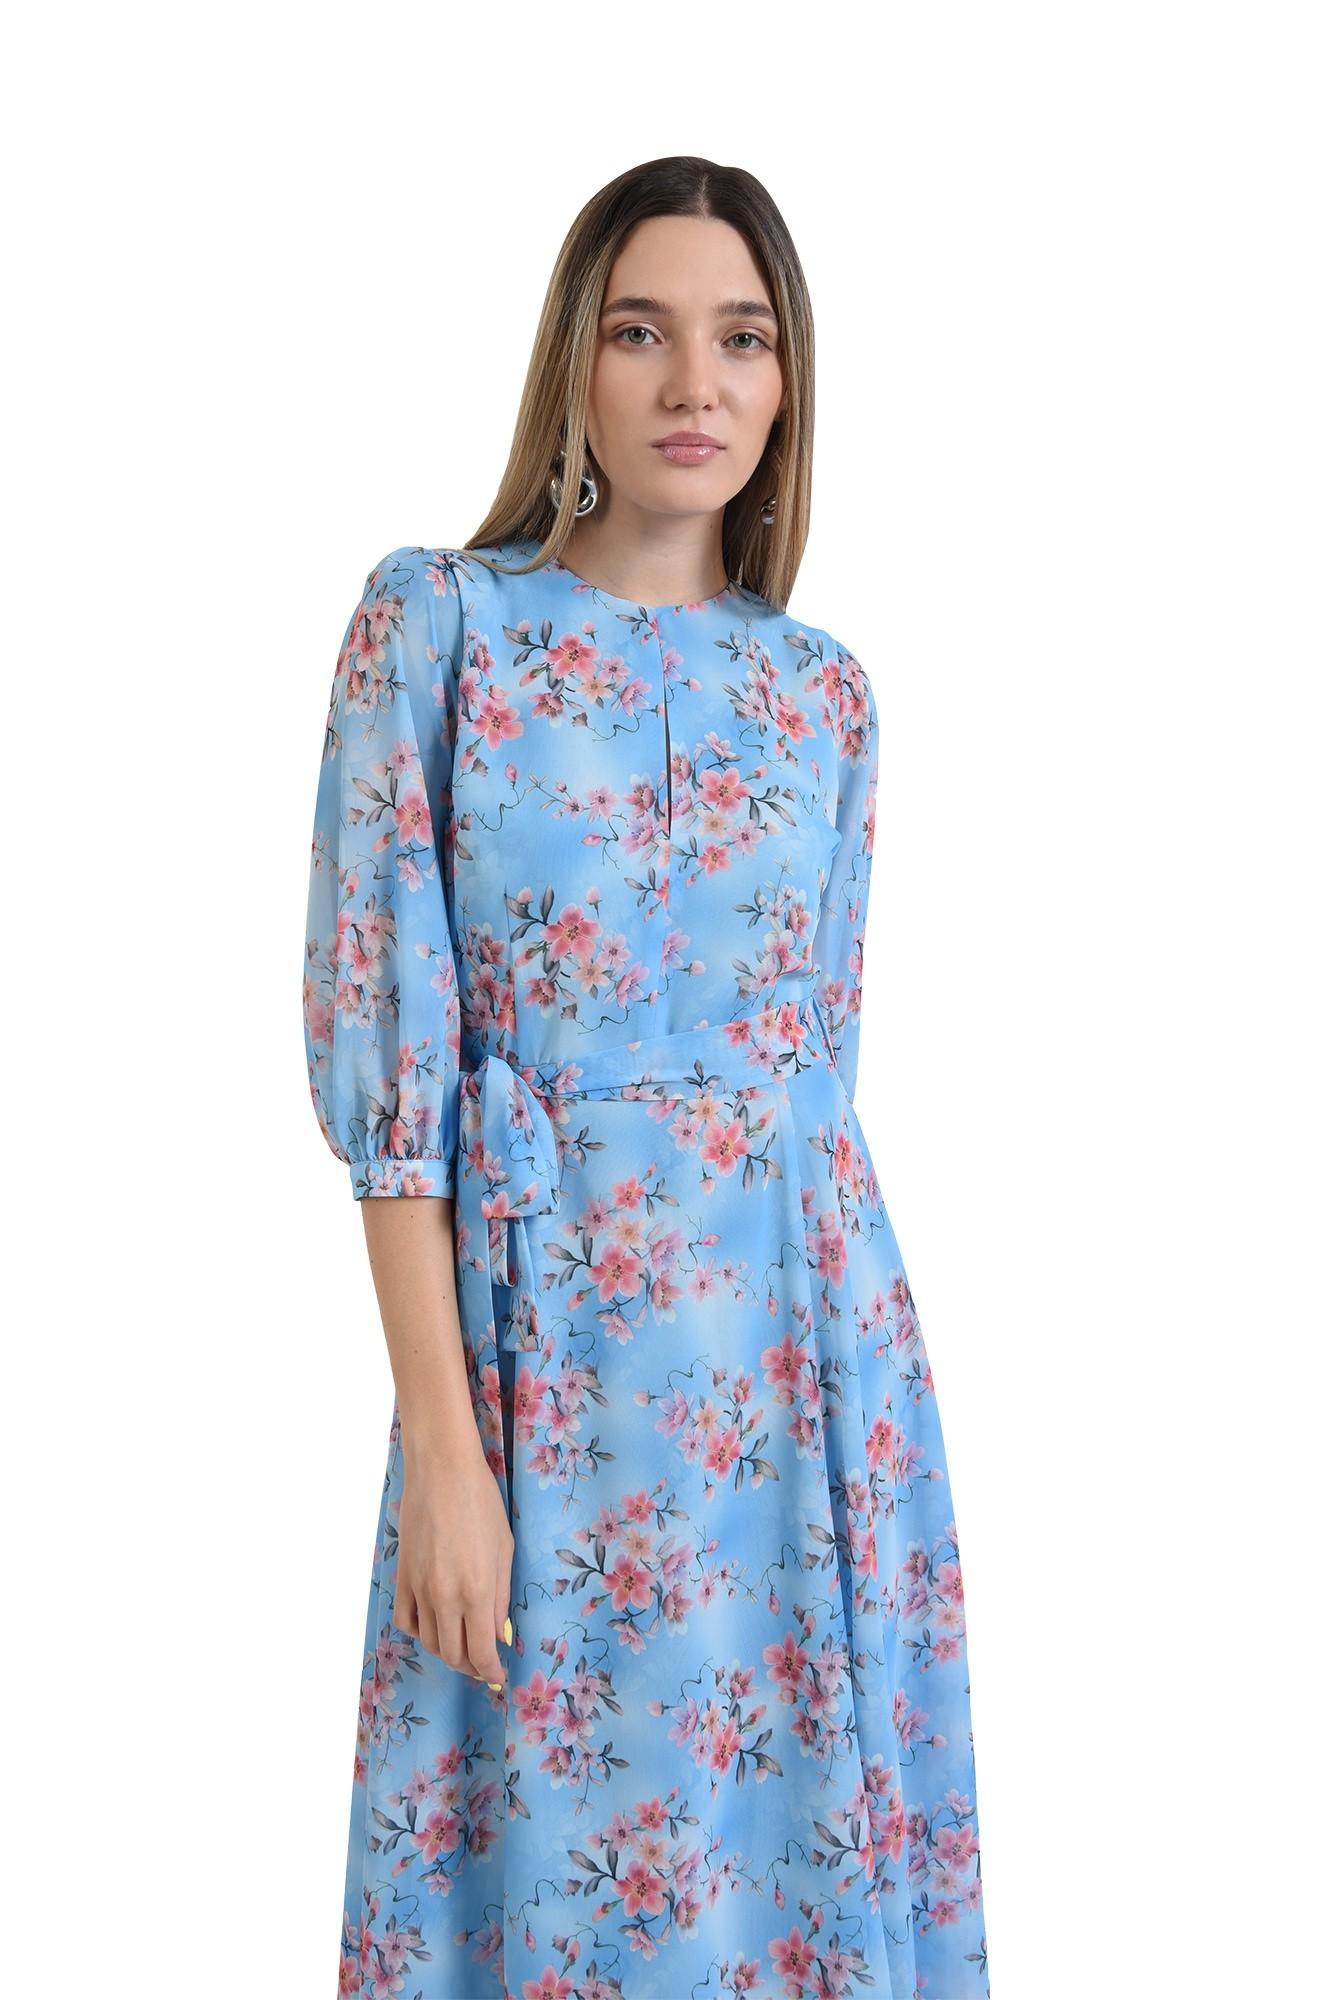 0 - rochie eleganta, poema, bleu, cu flori, midi